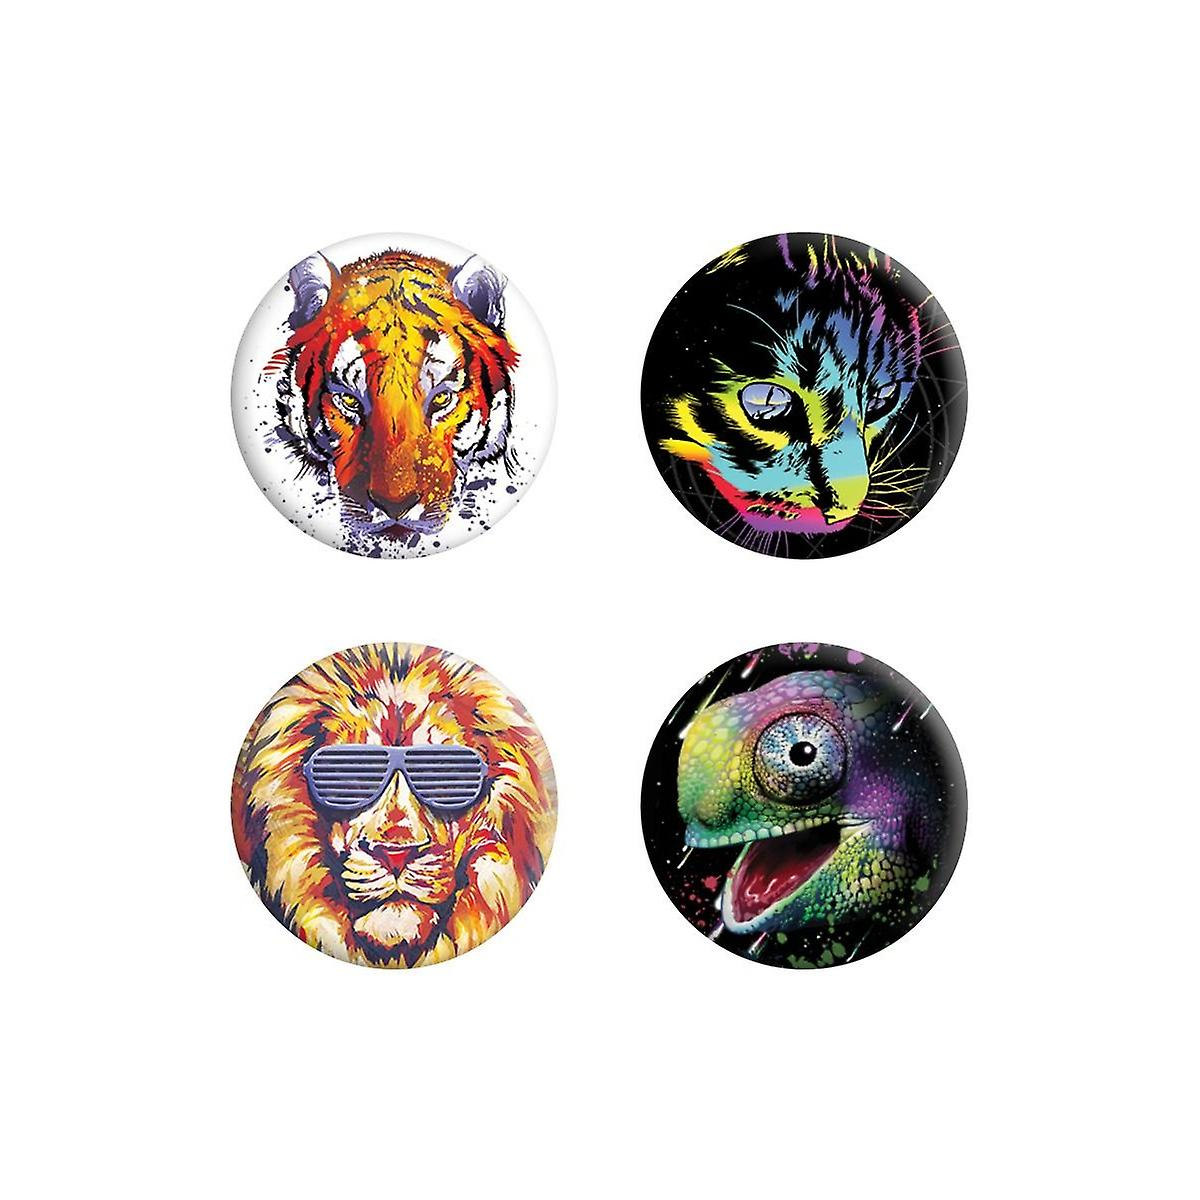 Unorthodox Collective Burning Bright Badge Pack